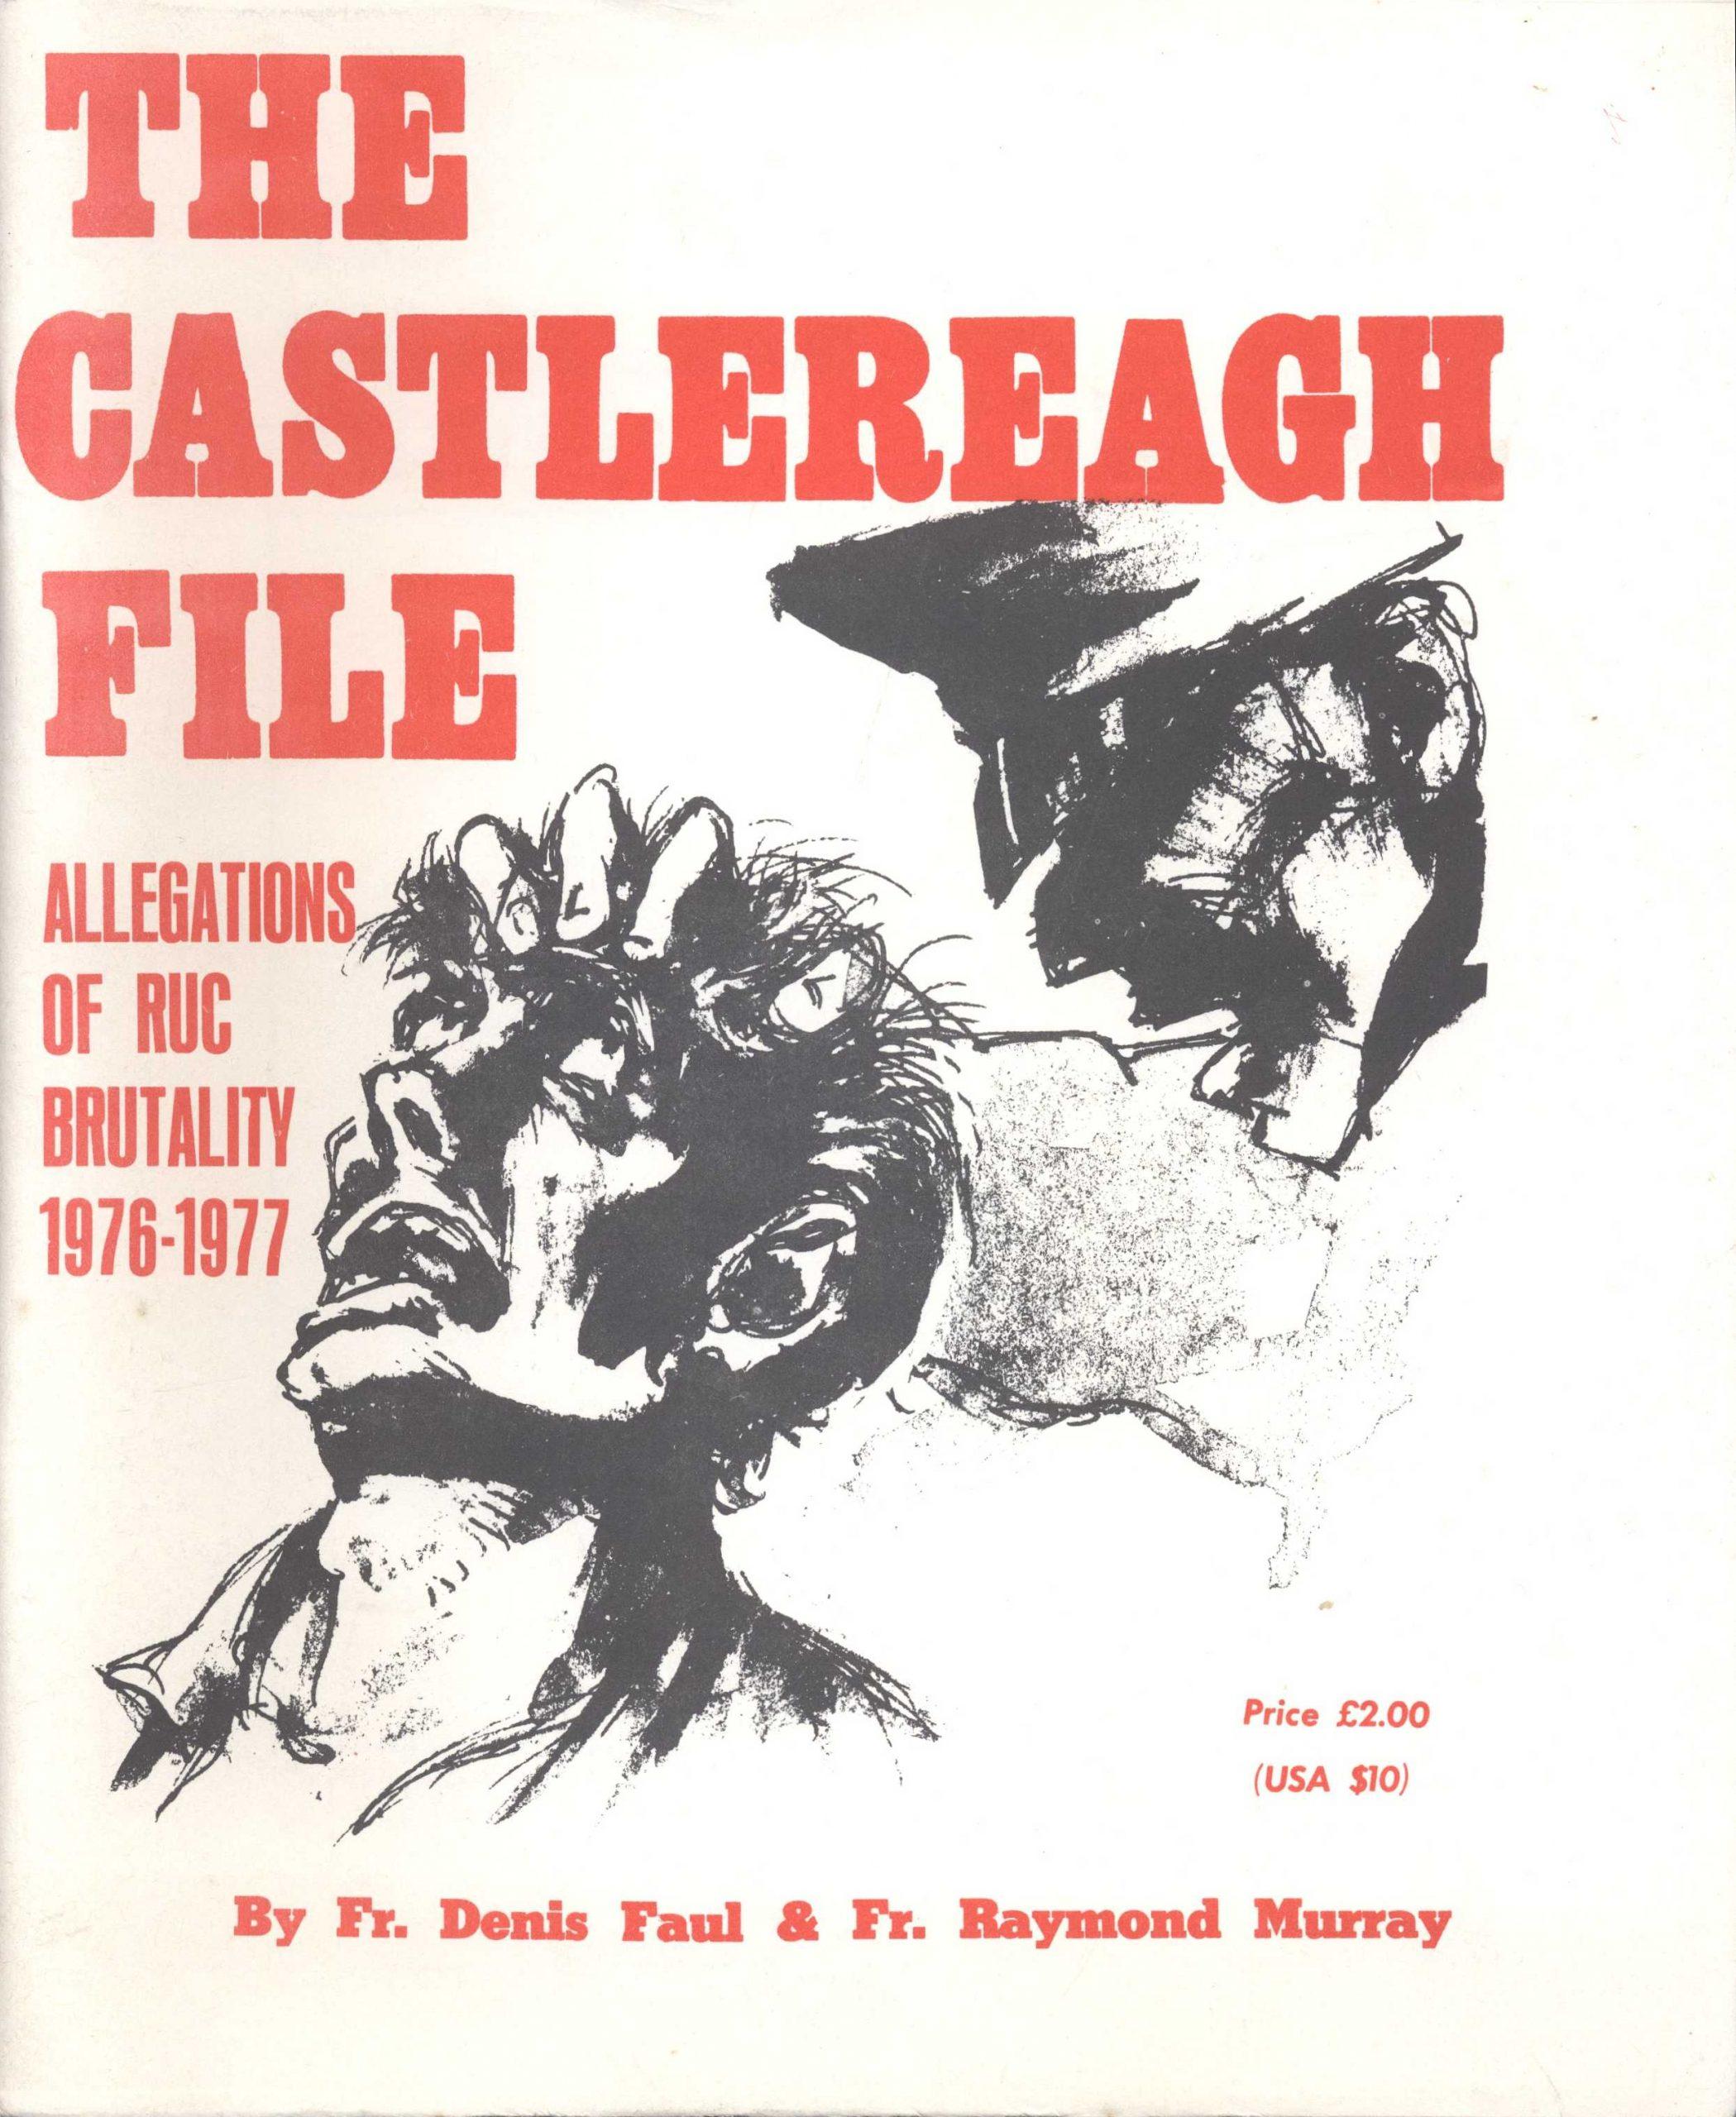 17 the castlereagh files 1978_1